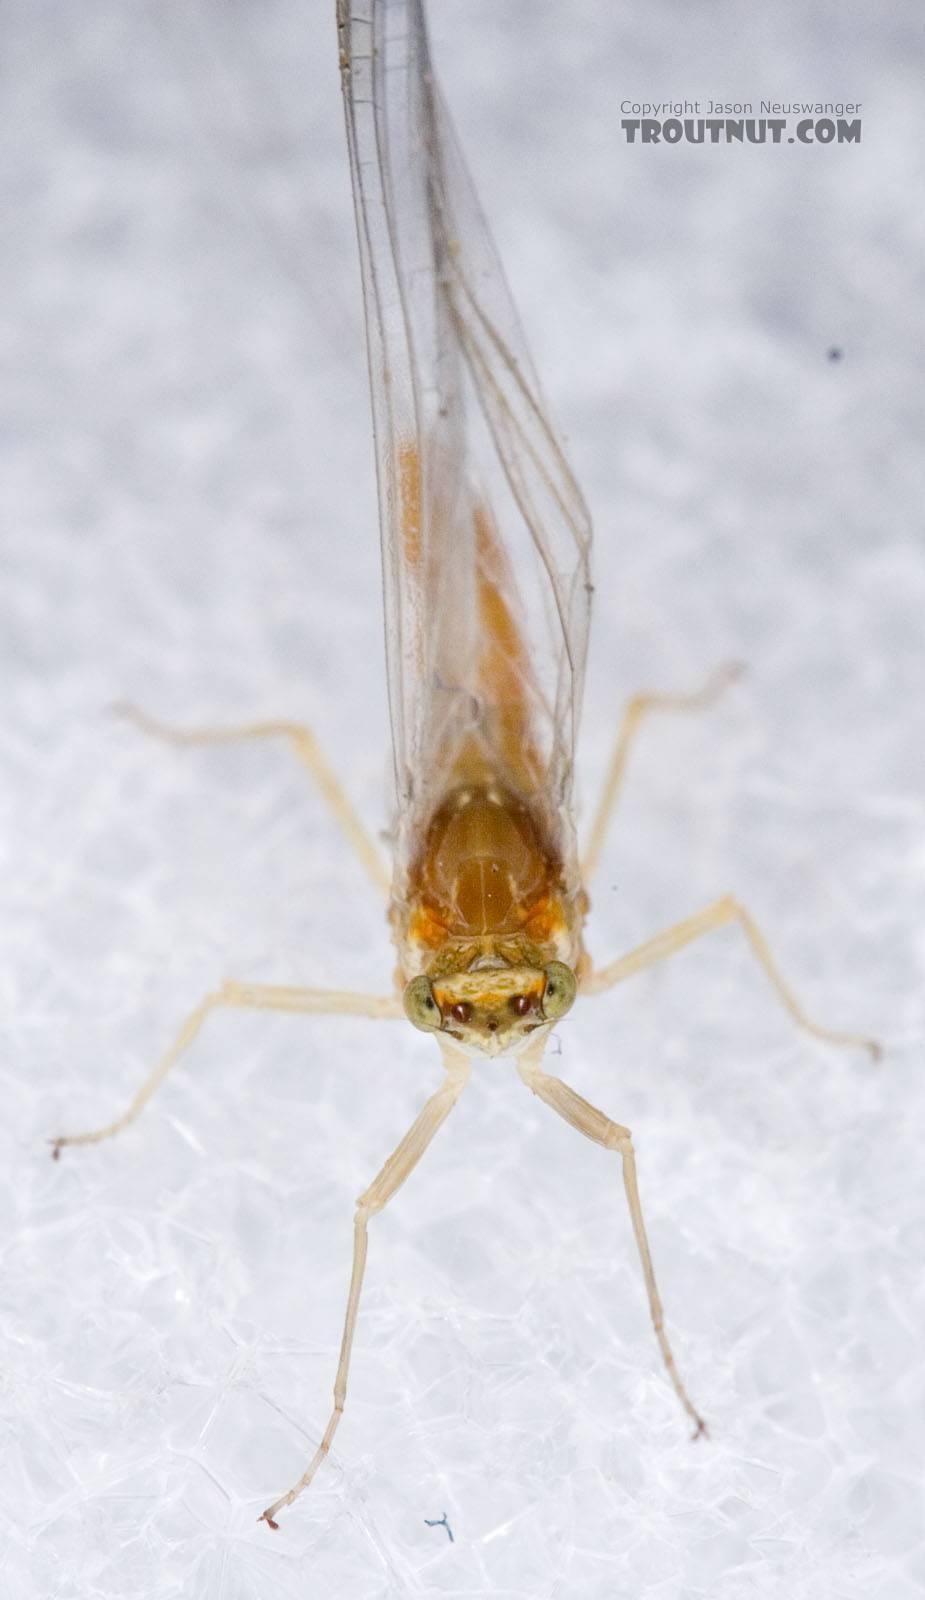 Female Ephemerella invaria (Sulphur Dun) Mayfly Spinner from Penn's Creek in Pennsylvania